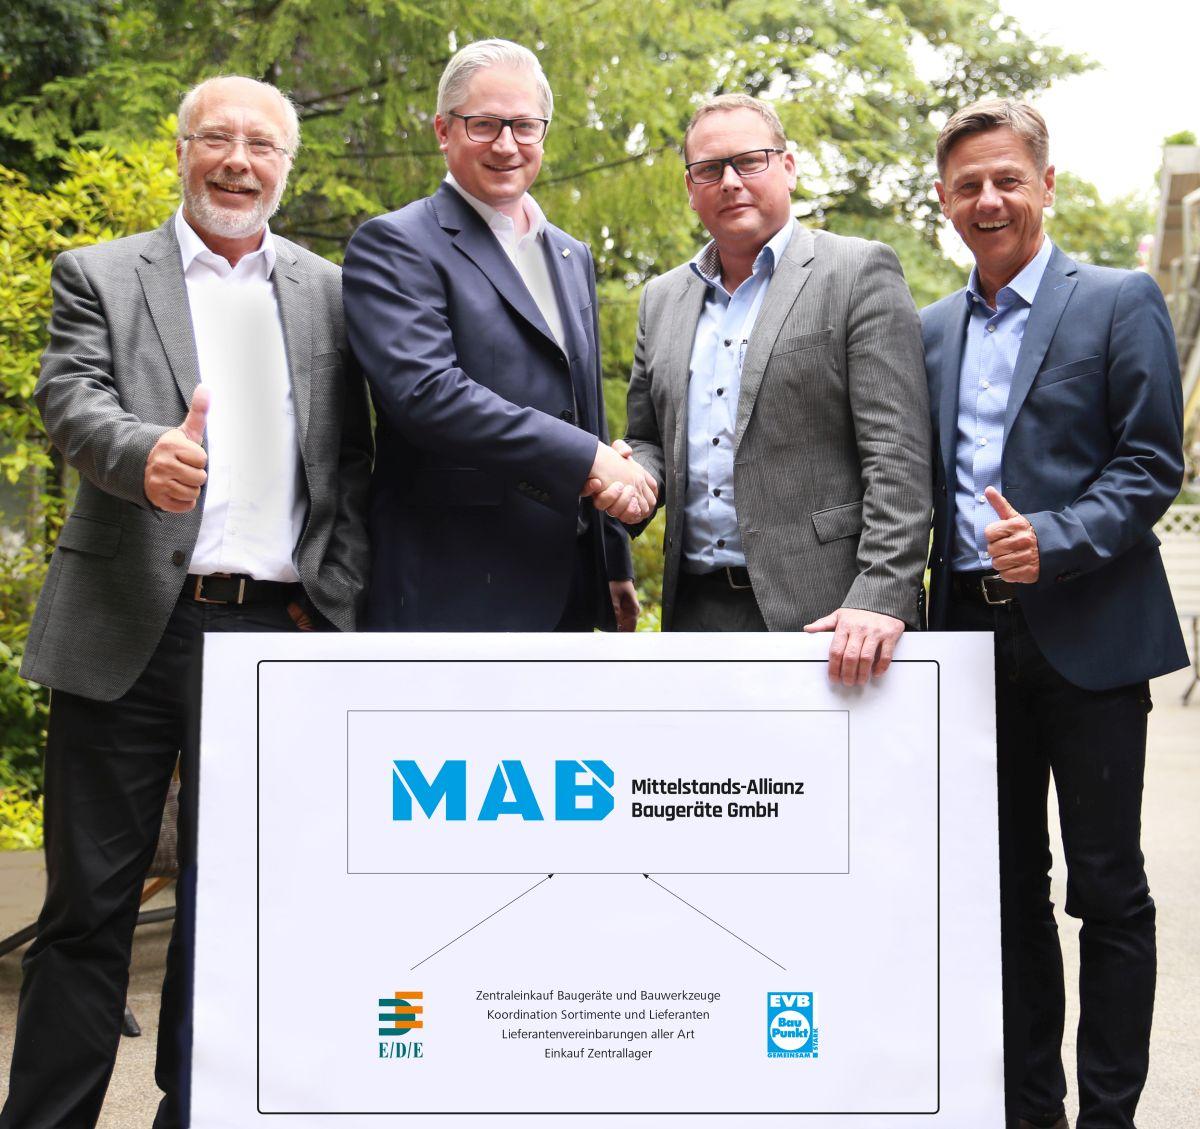 Einkaufs-Partnerschaft EVB Baupunkt & EDE